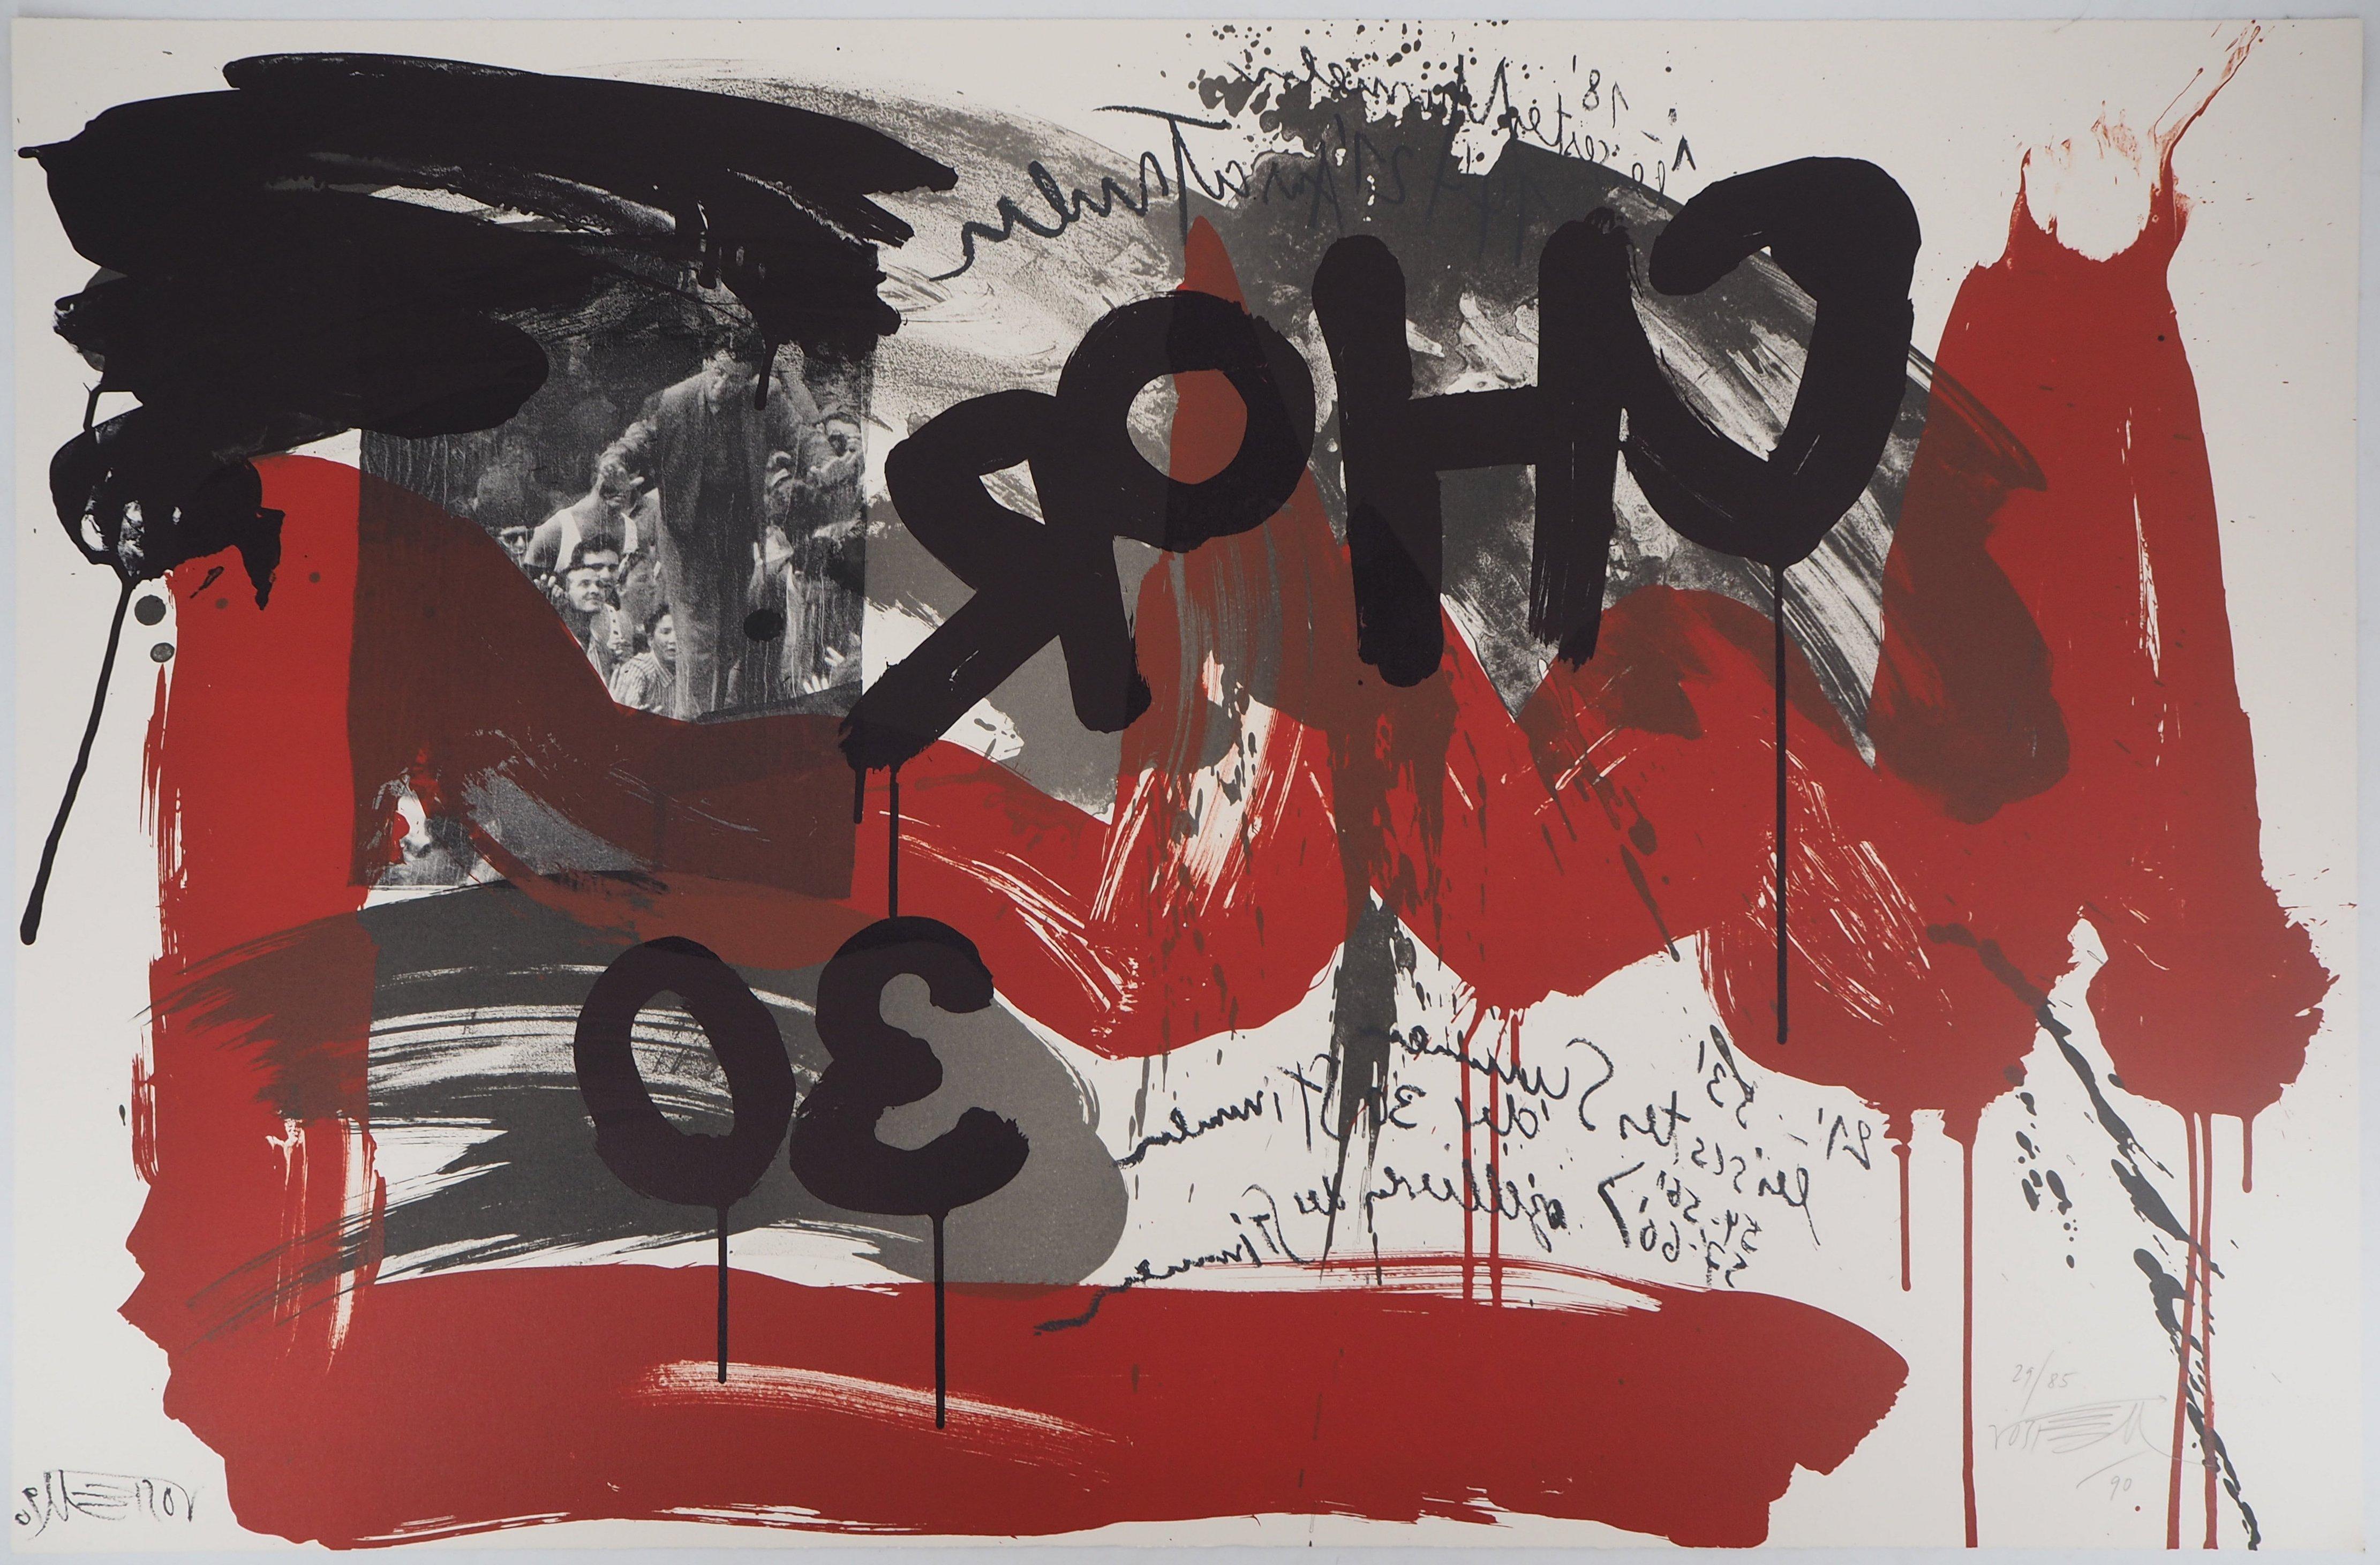 The Scream,  The Crowd - Original handsigned lithograph - Ltd 85 cop (Fluxus)